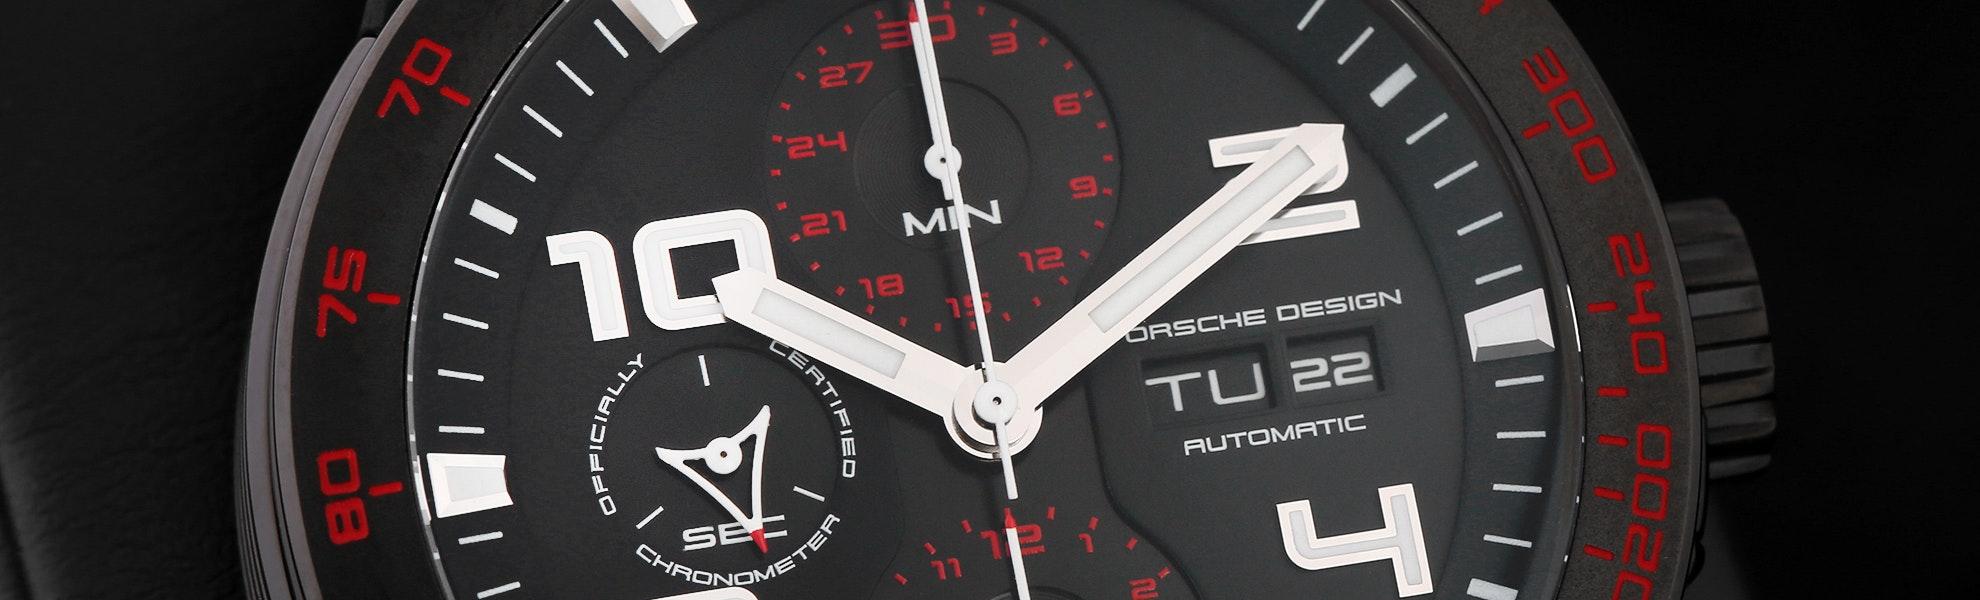 Porsche Design P'6340 Flat Six Automatic Watch